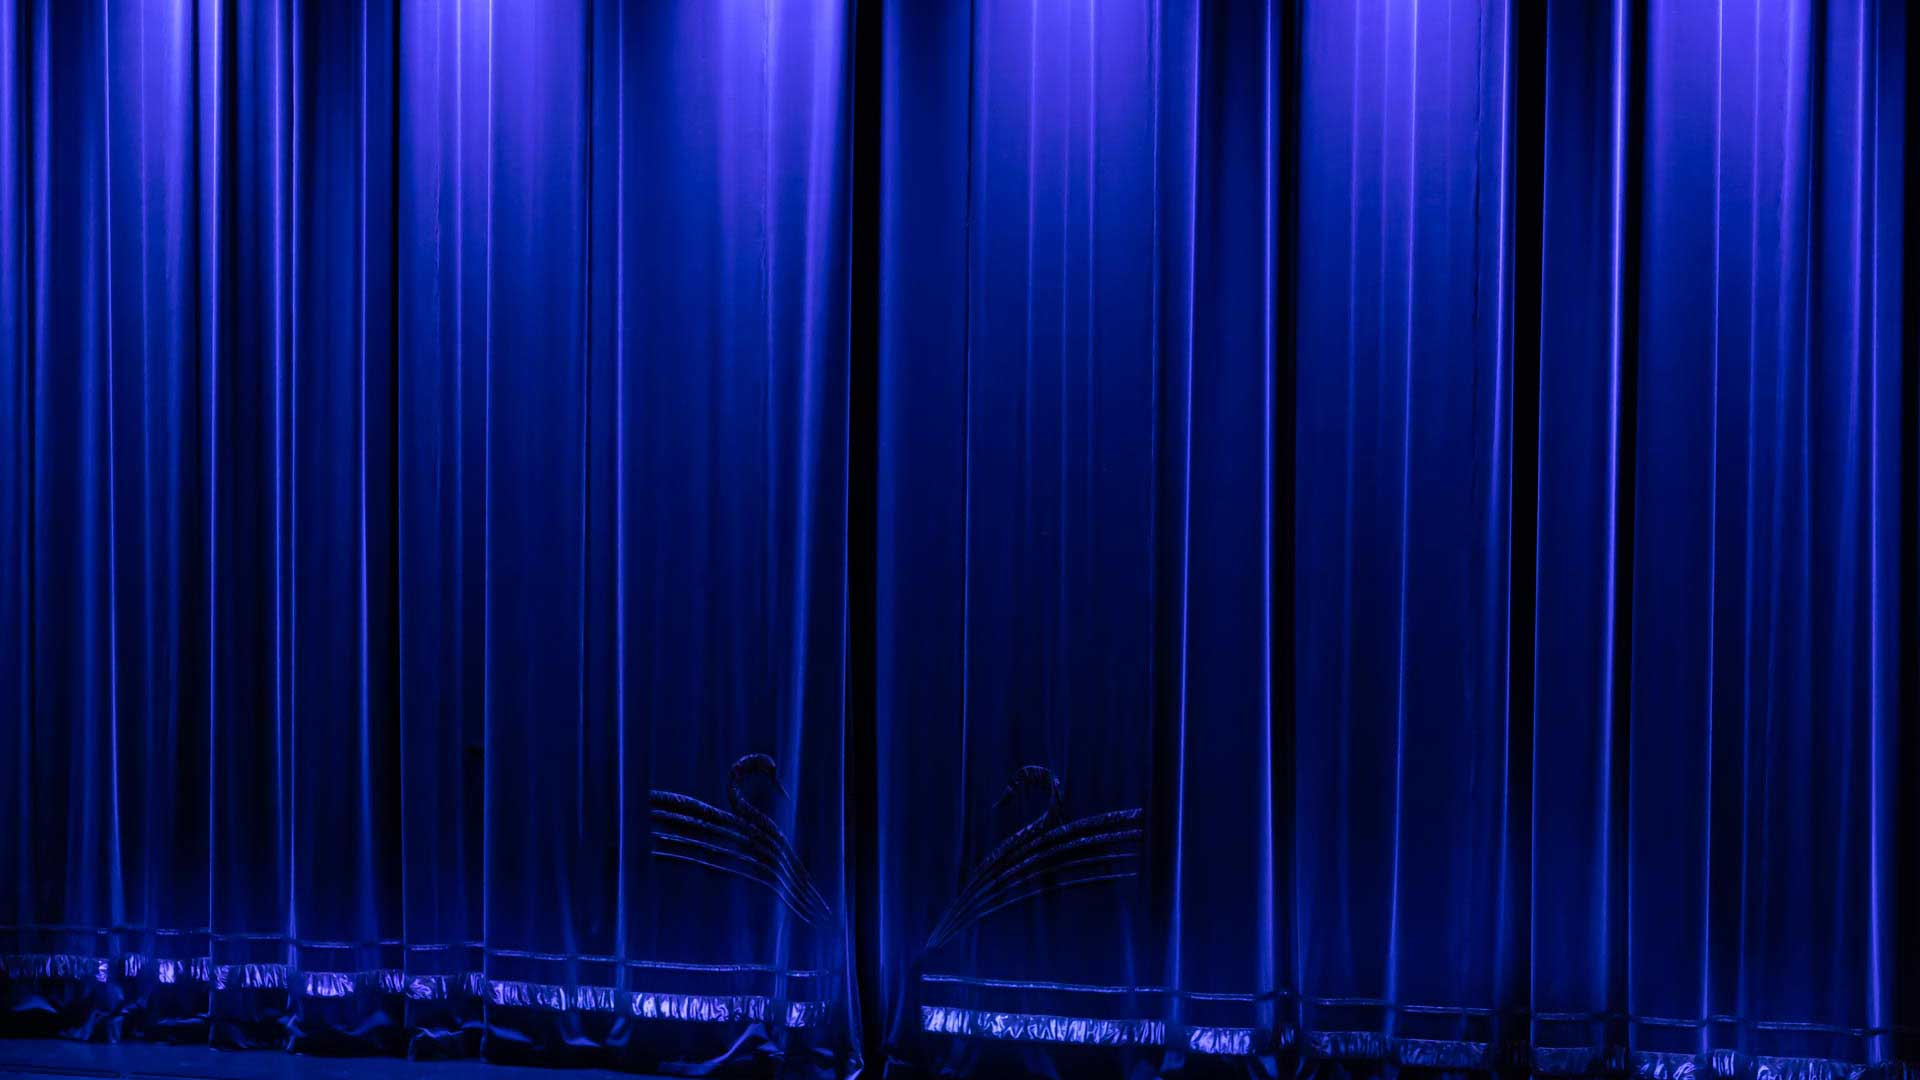 Bühnenvorhang Ludwig II Musical